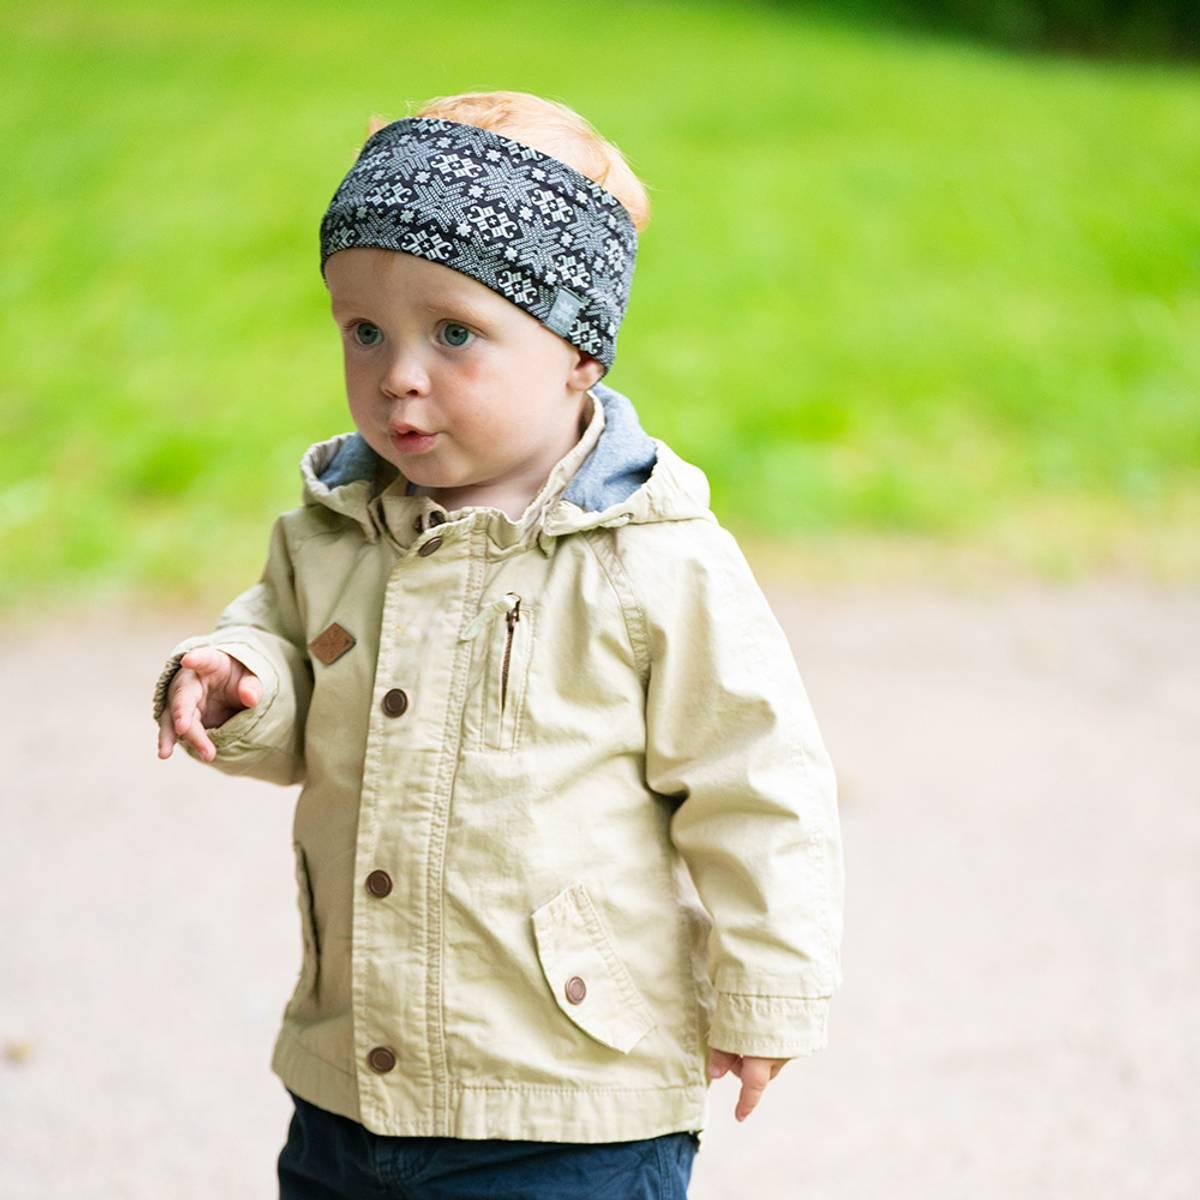 Morild Glitre Junior pannebånd med refleks, sort